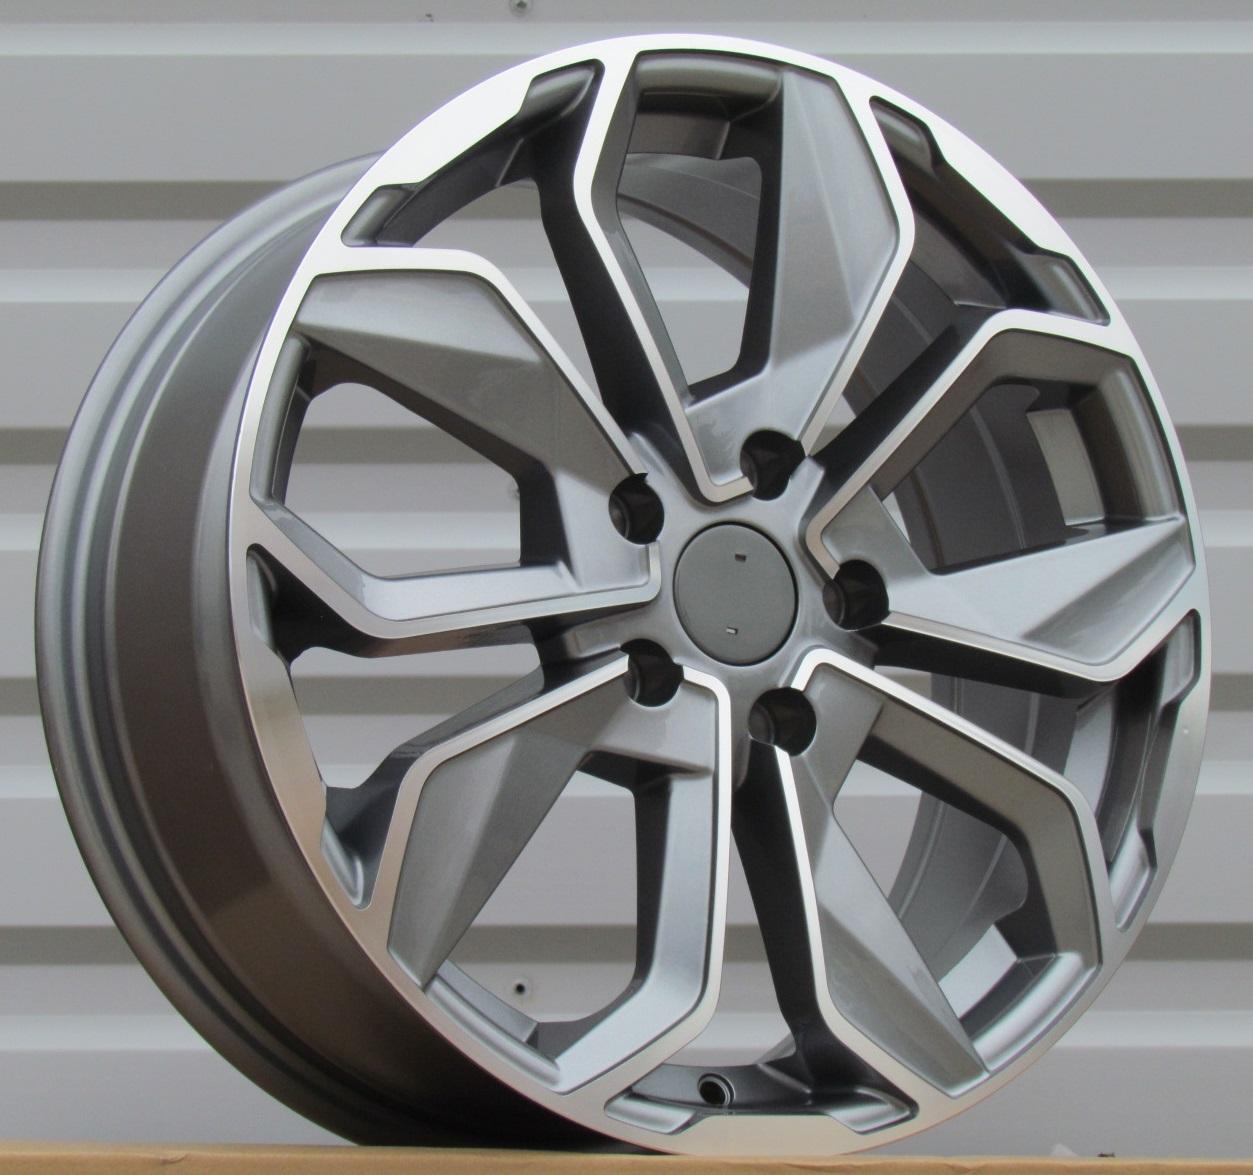 R17X7 5x114.3 ET45 66.1 XFE164 MG RWR Renault (K3+K4) 7x17 ET45 5x114.3